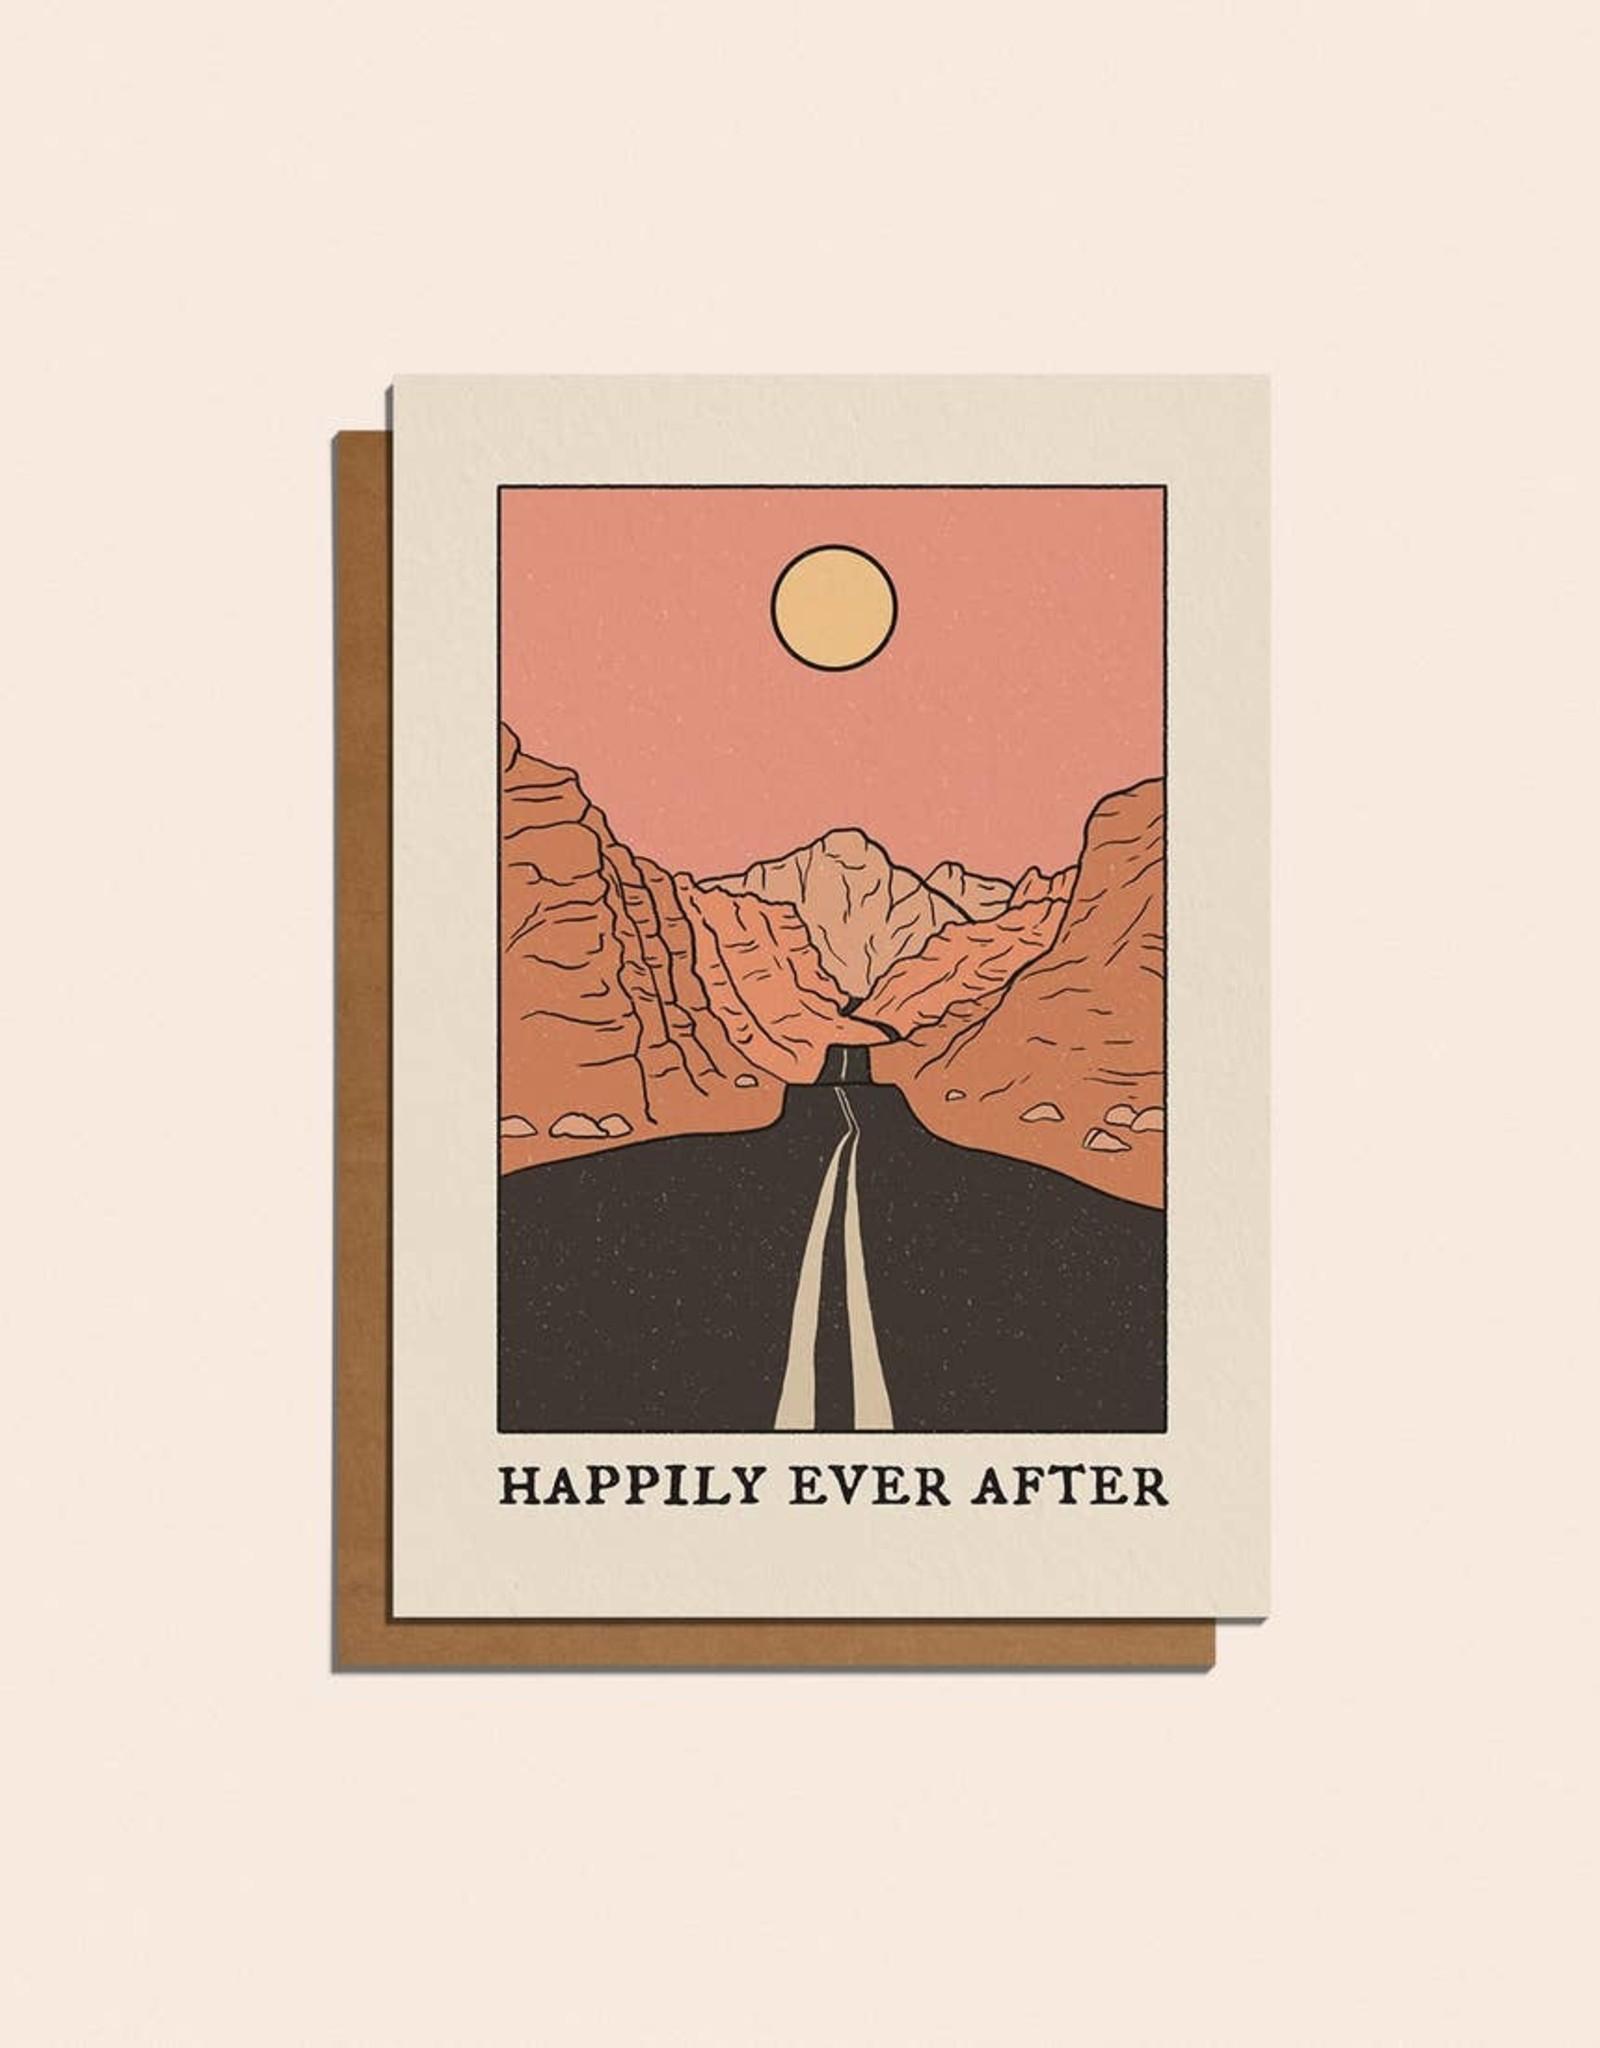 Cai & Jo Cai & Jo | Happily Ever After